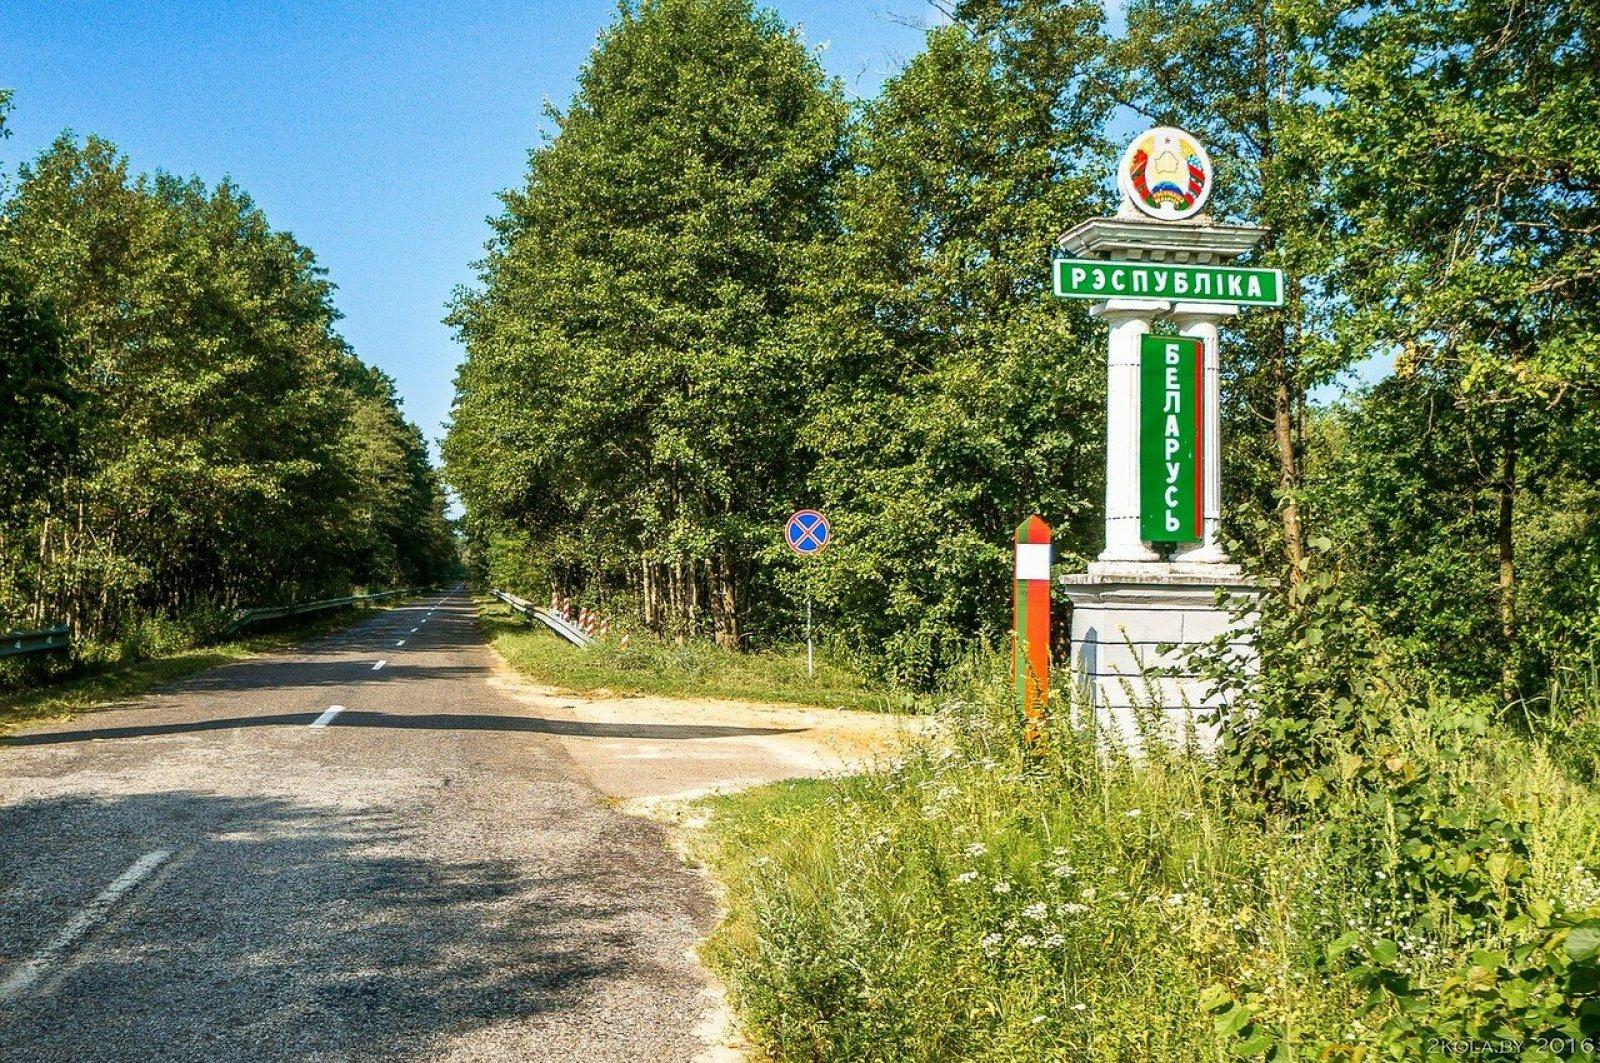 Велопоход на Шацкие озёра. Граница Беларусь-Украина